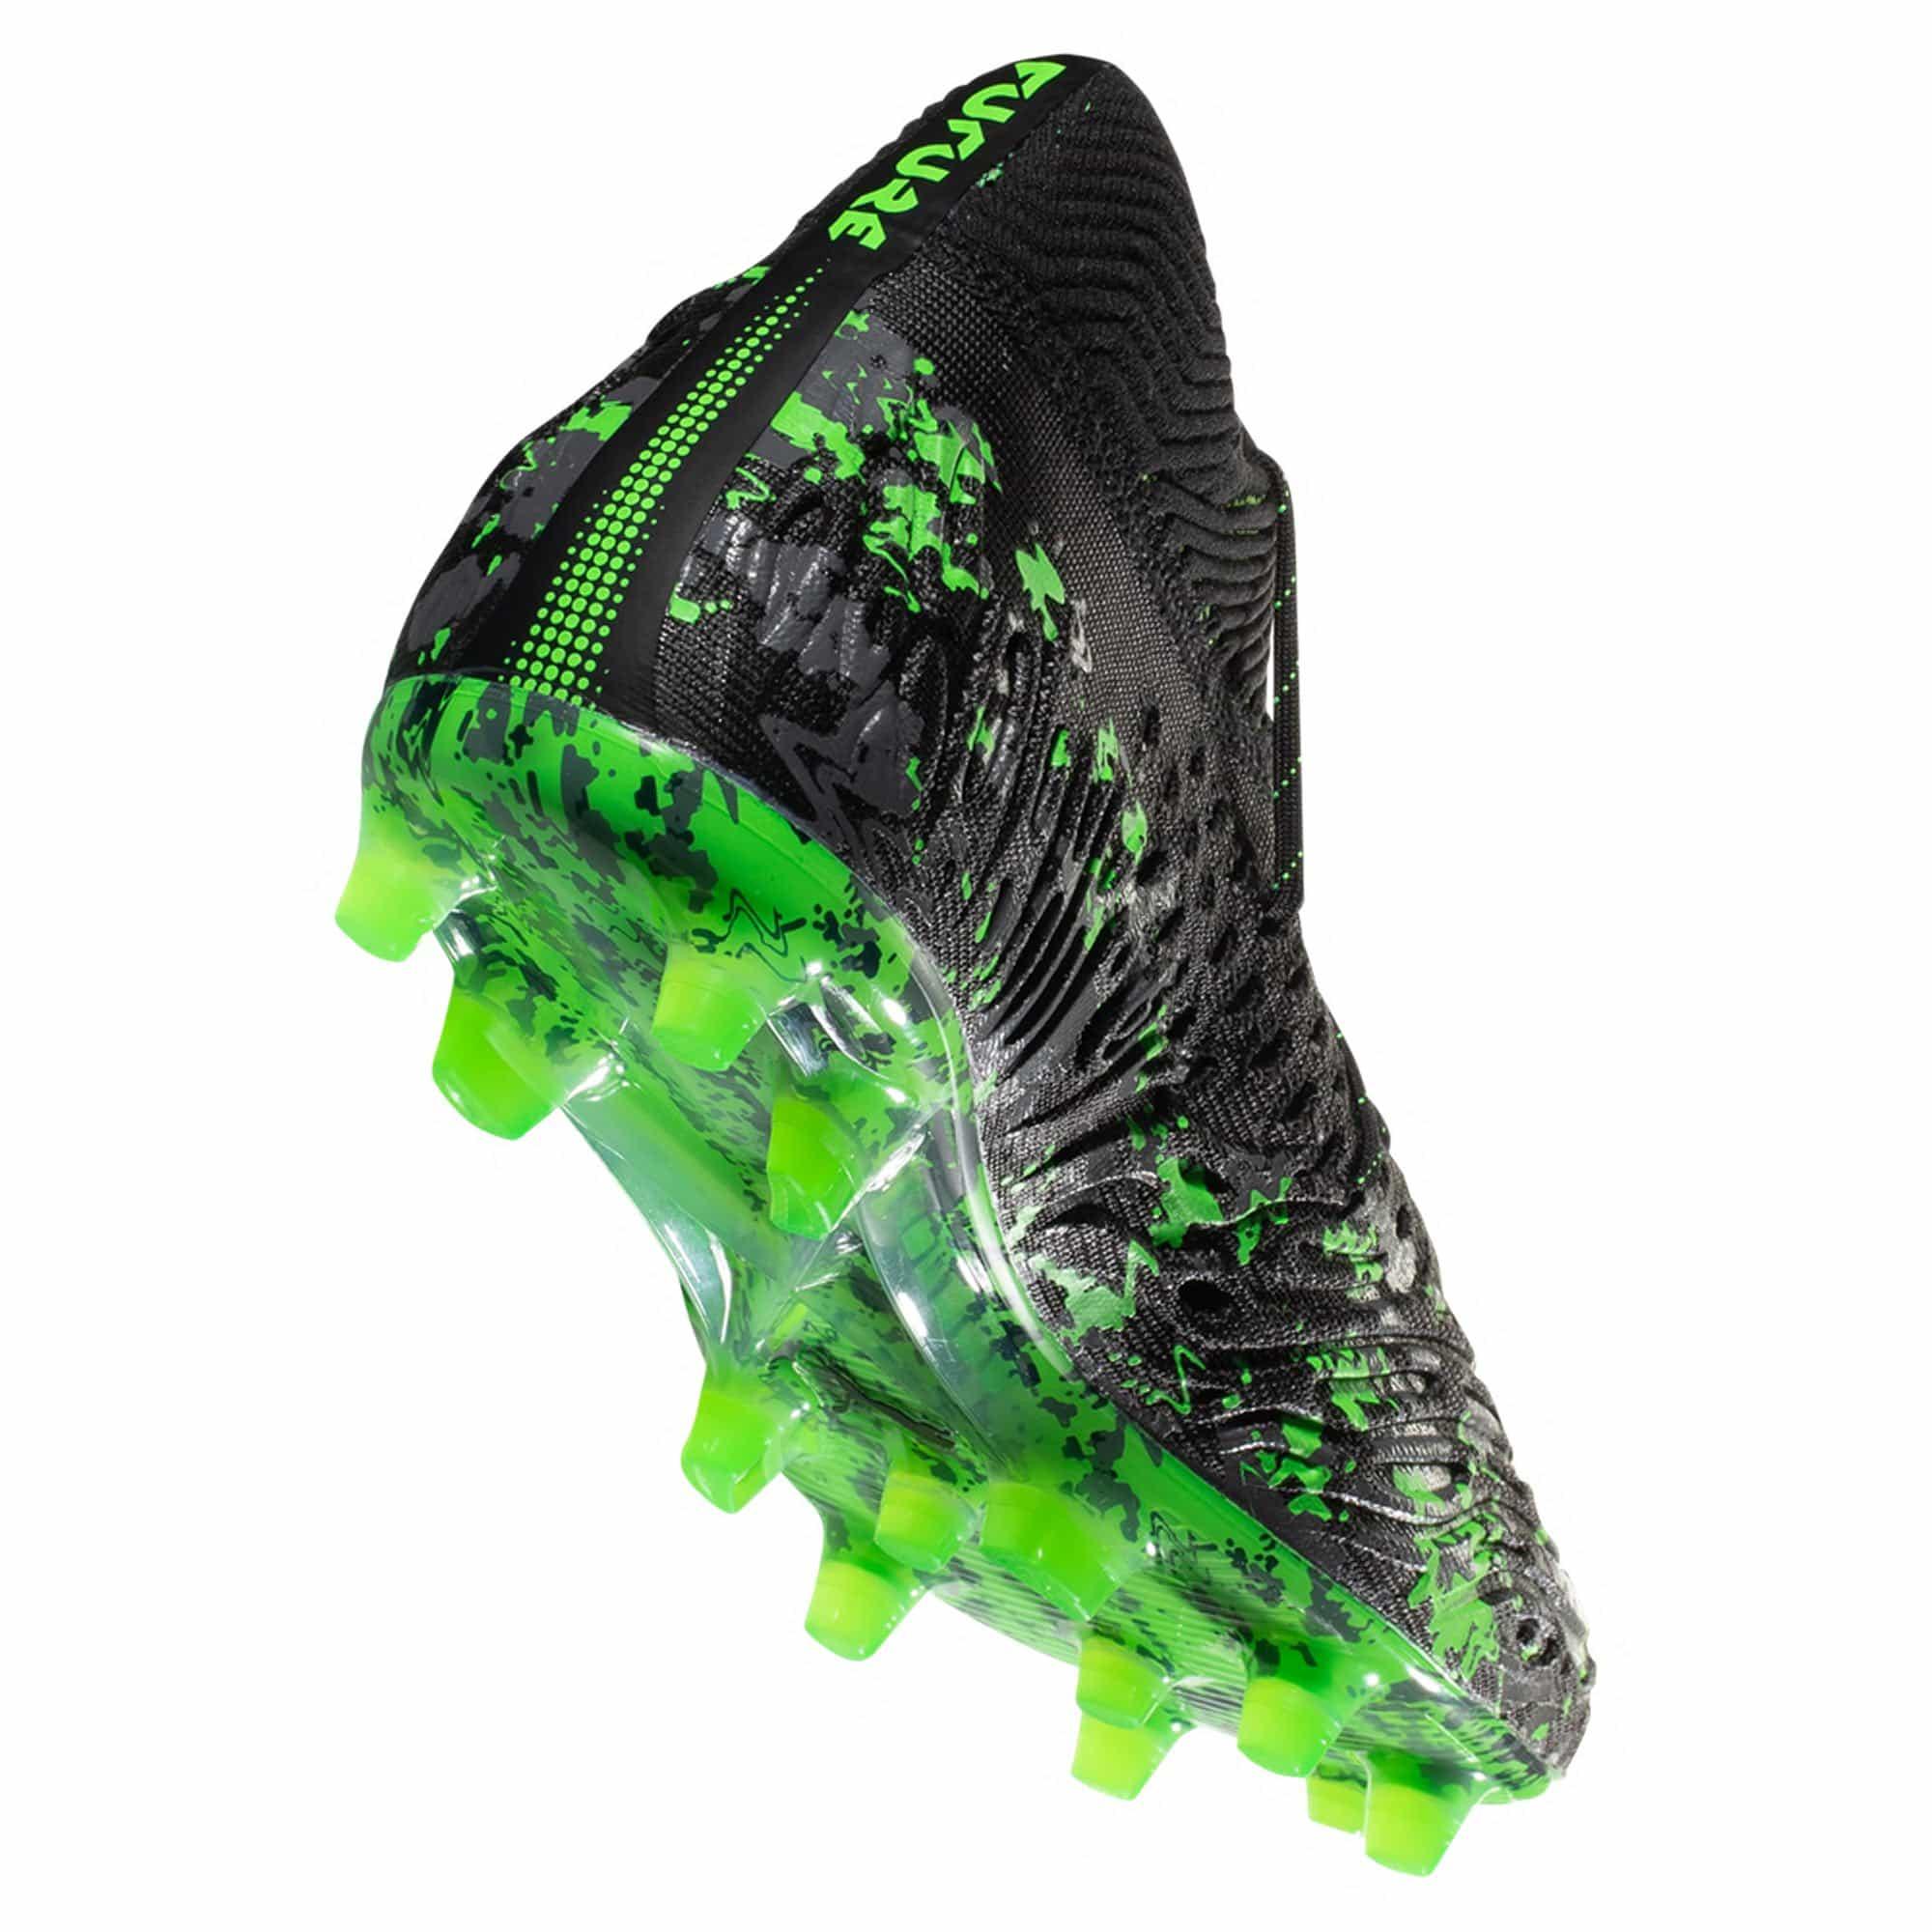 e53c7bb06 Home   Brand   Puma   PUMA FUTURE 19.1 FG AG Firm Ground Soccer Cleat –  Black   Charcoal   Green